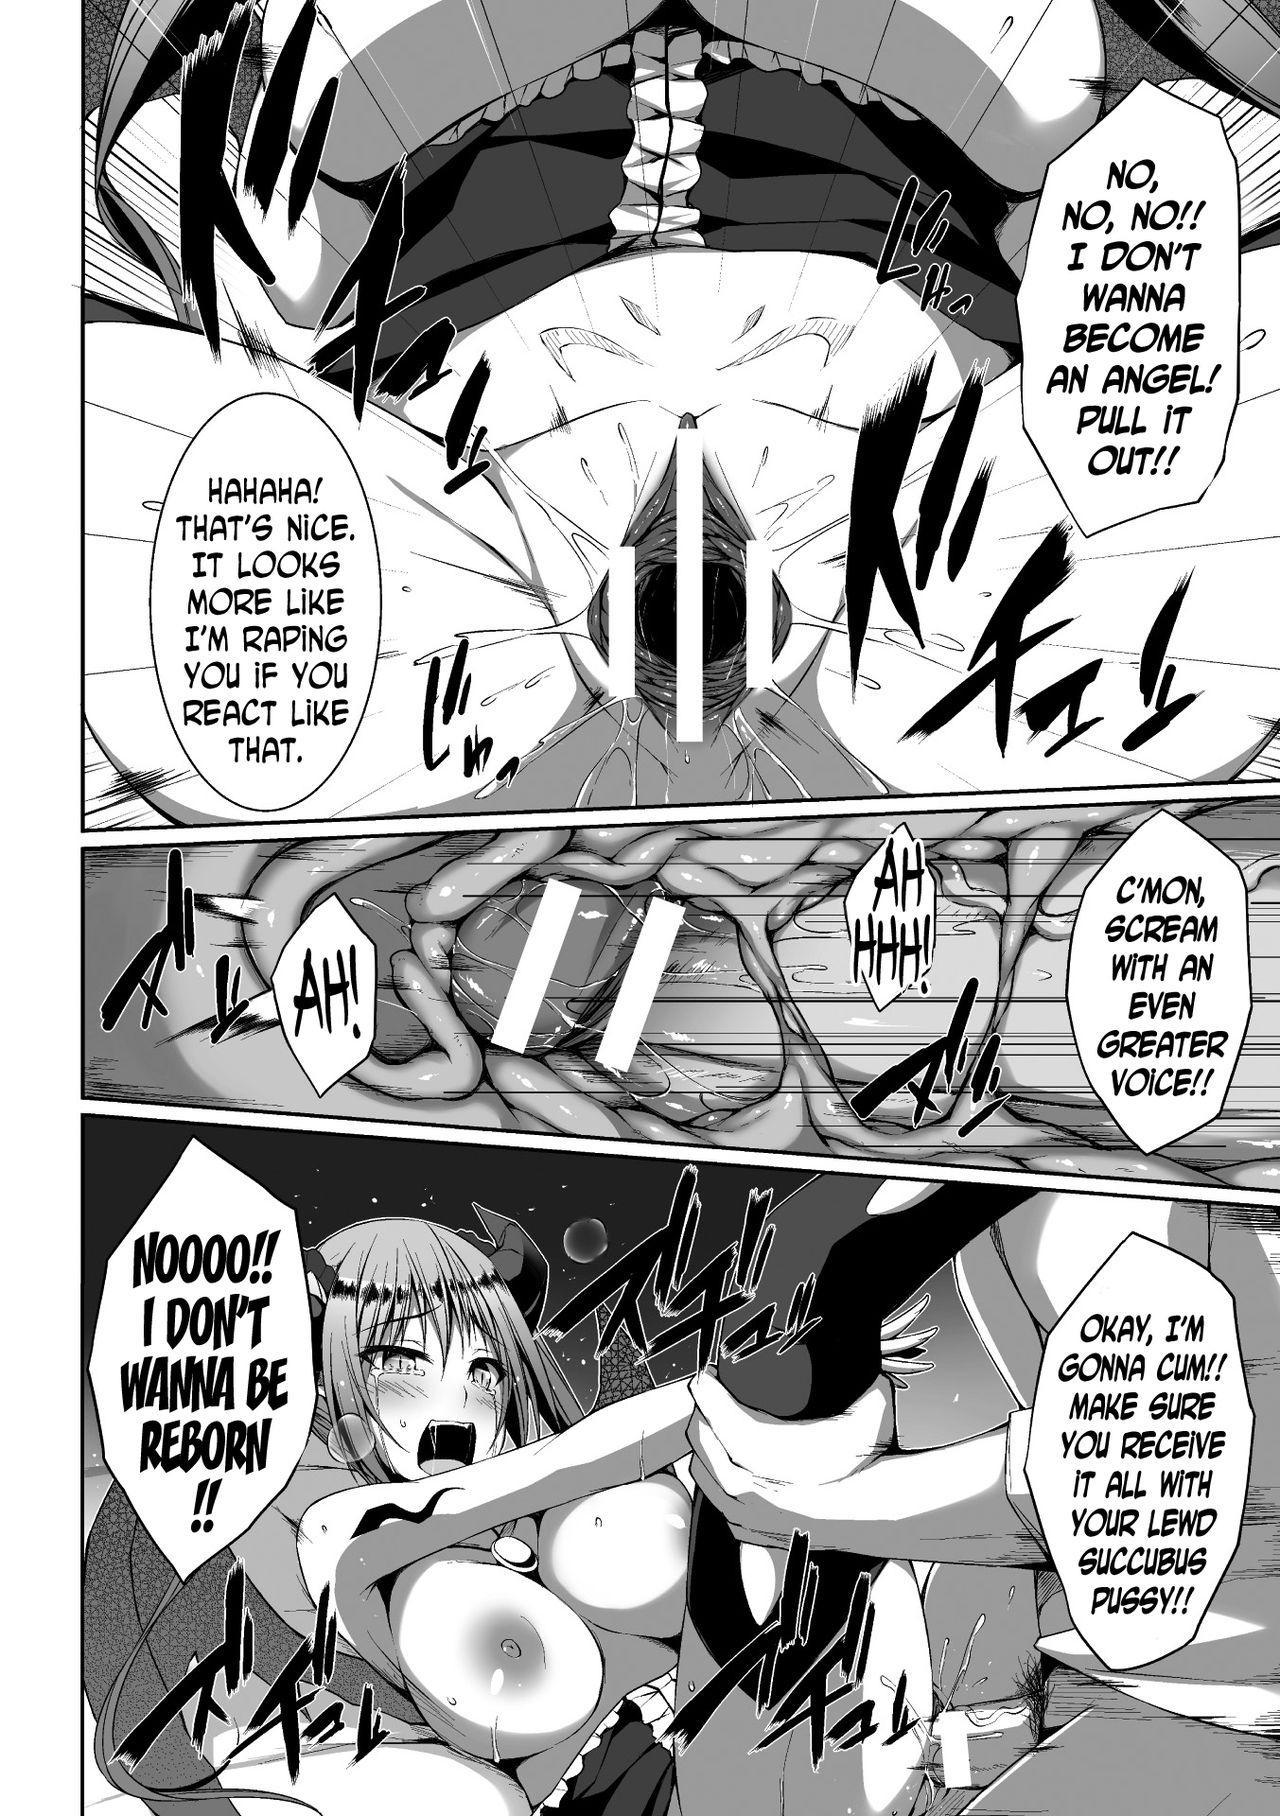 [Anthology] 2D Comic Magazine Tenshi ni Ochiru Akuma-tachi Vol. 1 Ch. 1-2 [English] [N04h] [Digital] 15